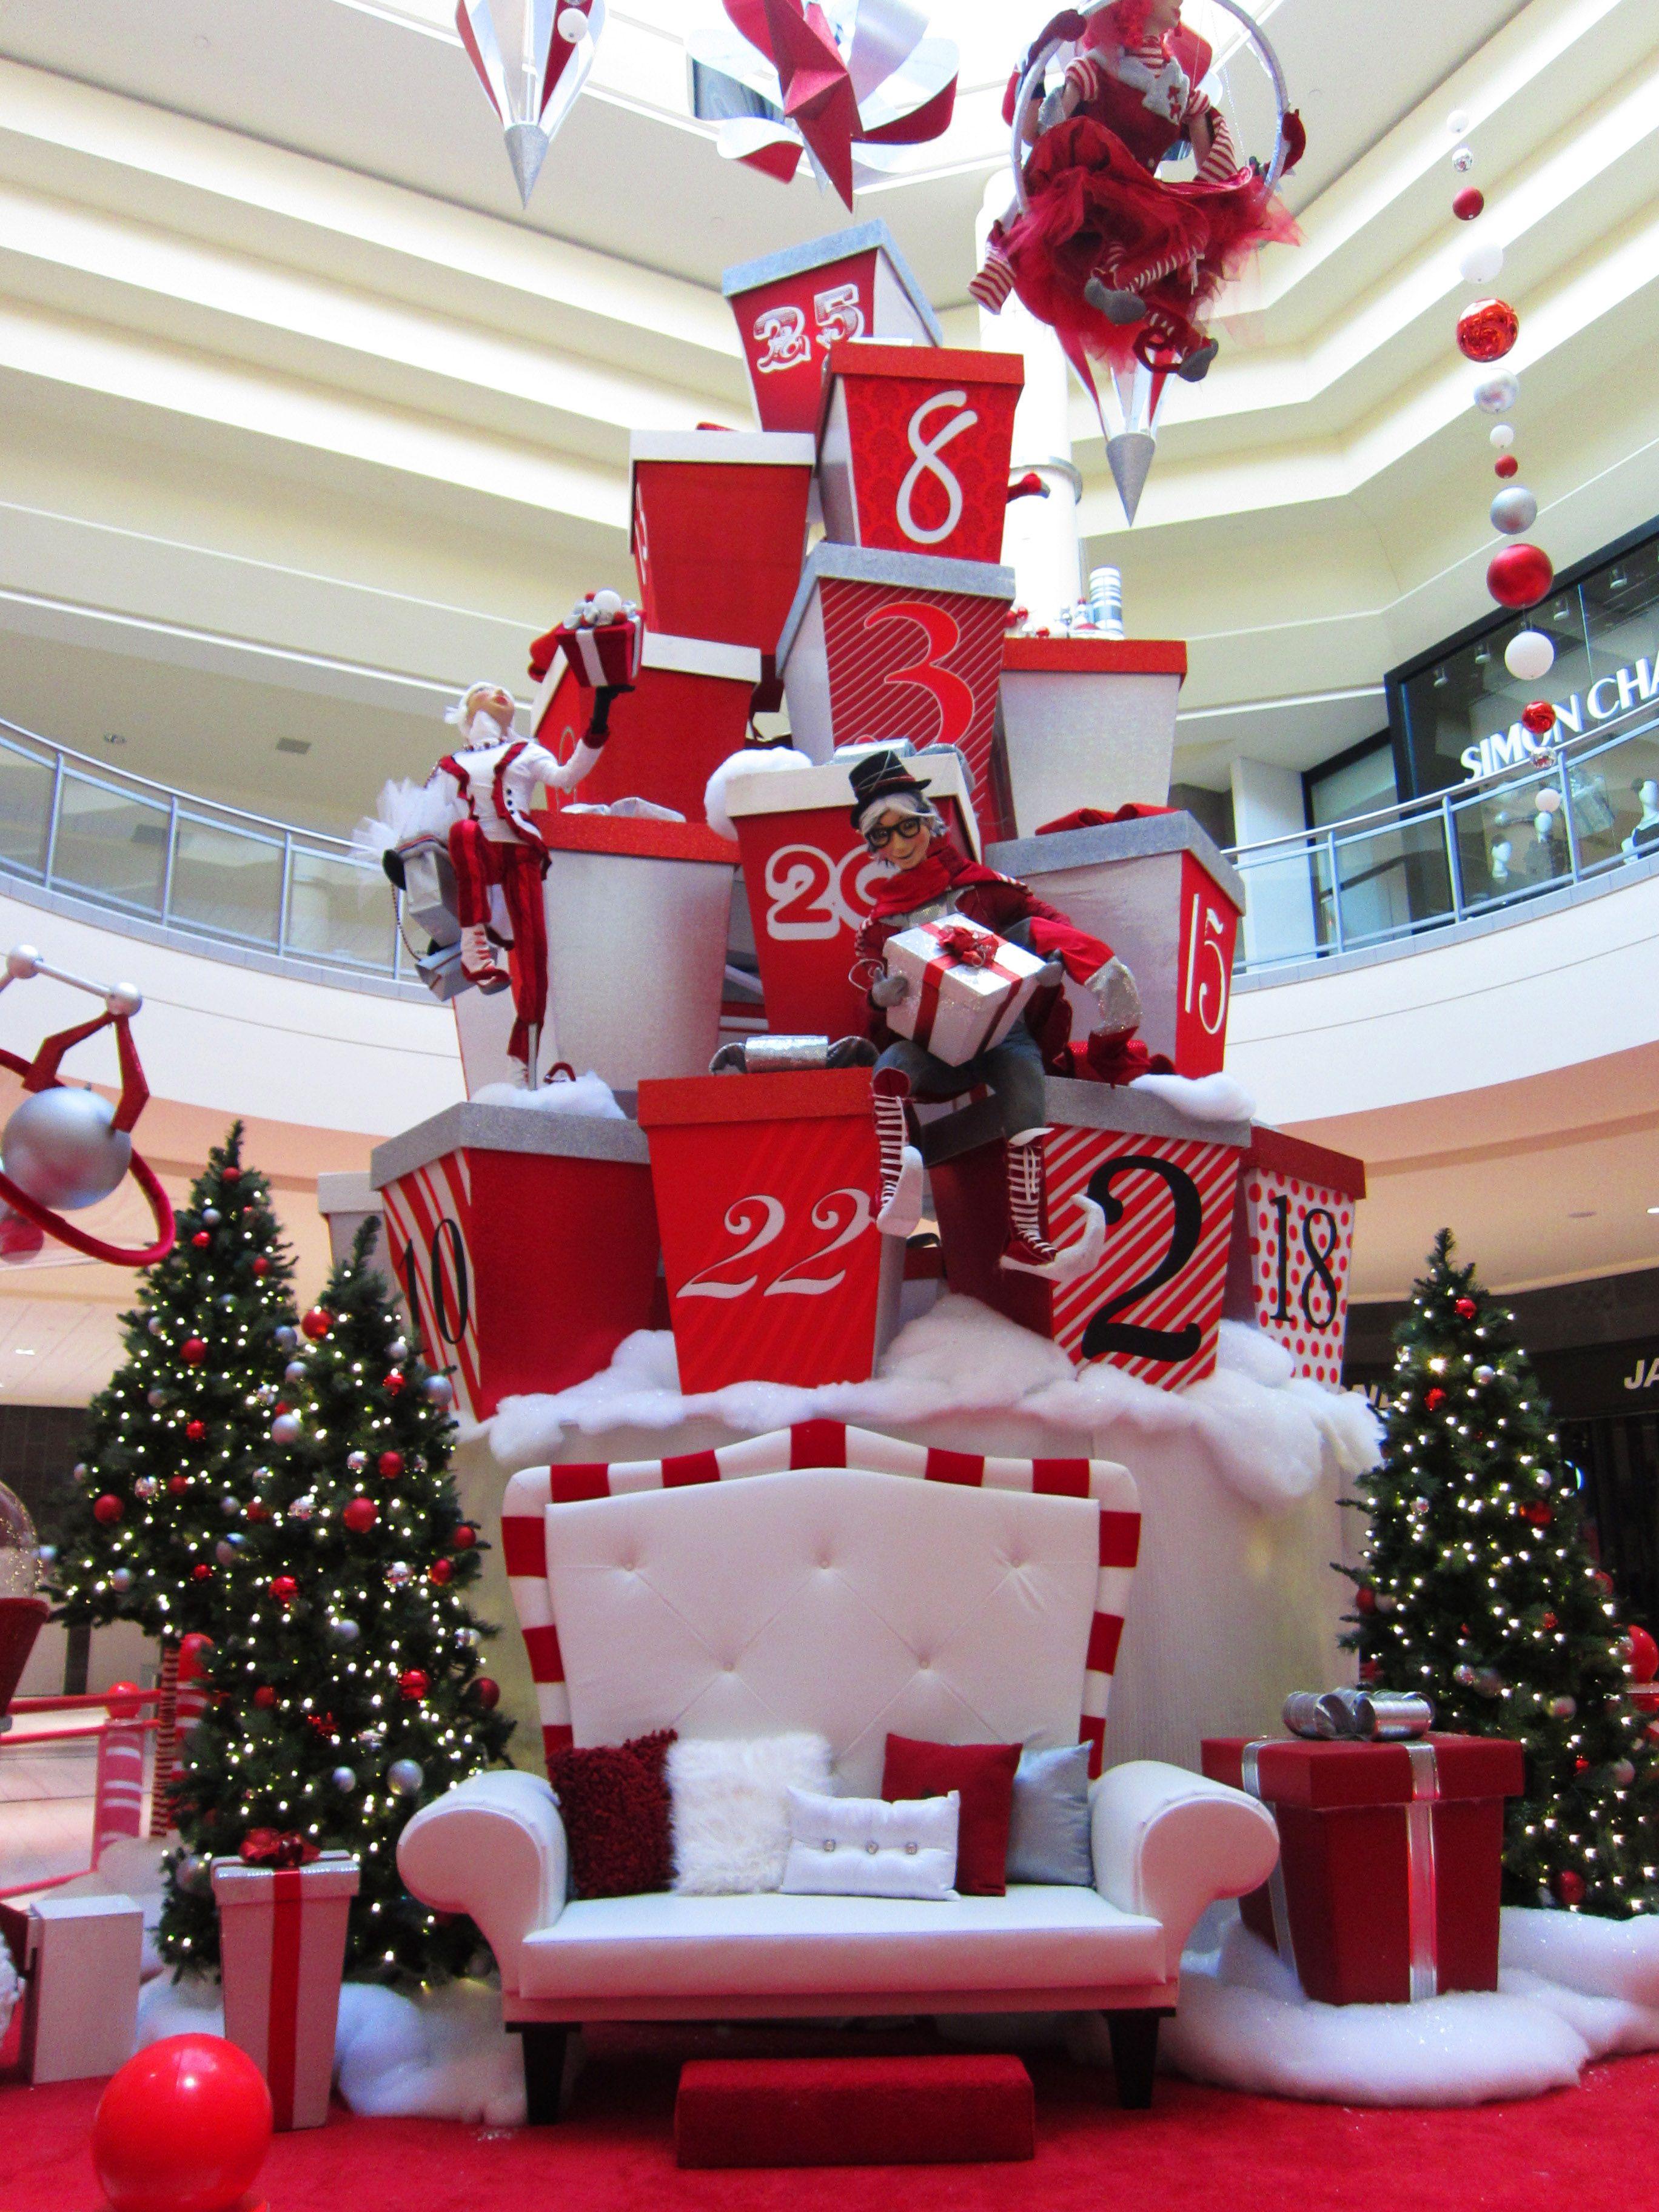 Christmas Decor For Upper Canada Mall Decor De Noel Christmas